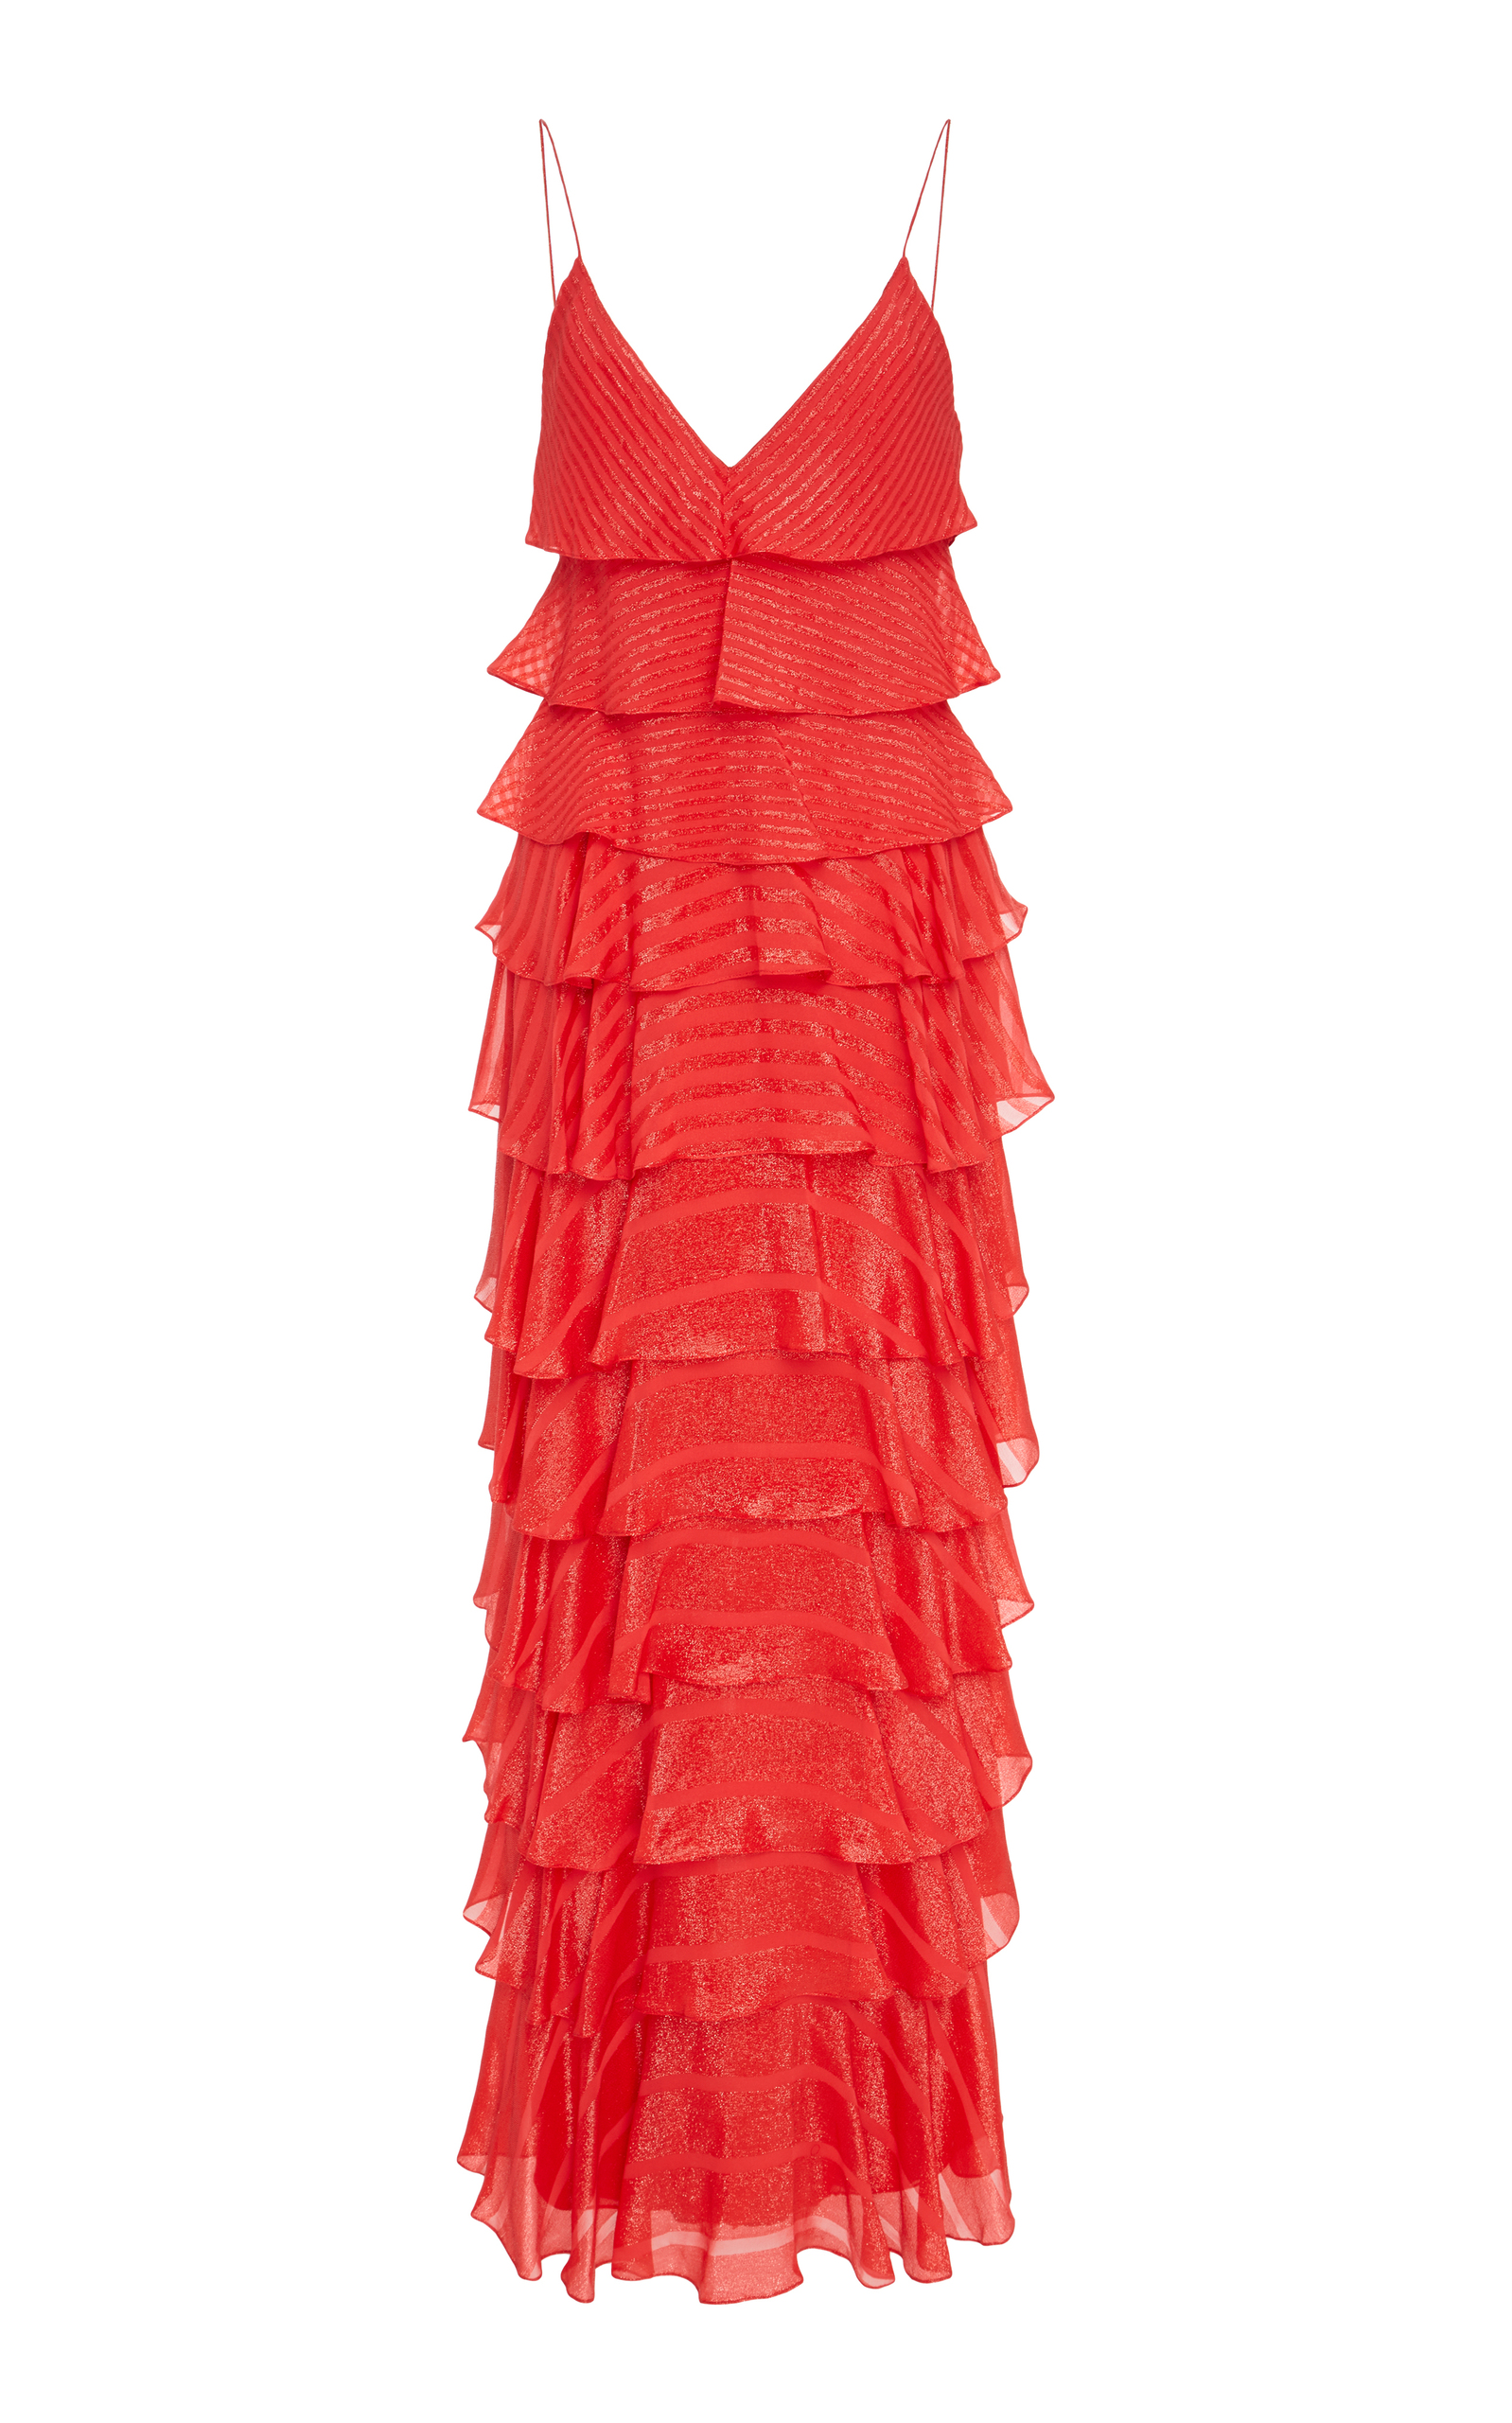 J MENDEL Metallic Striped Silk-Blend Gown - Tangerine Size 4